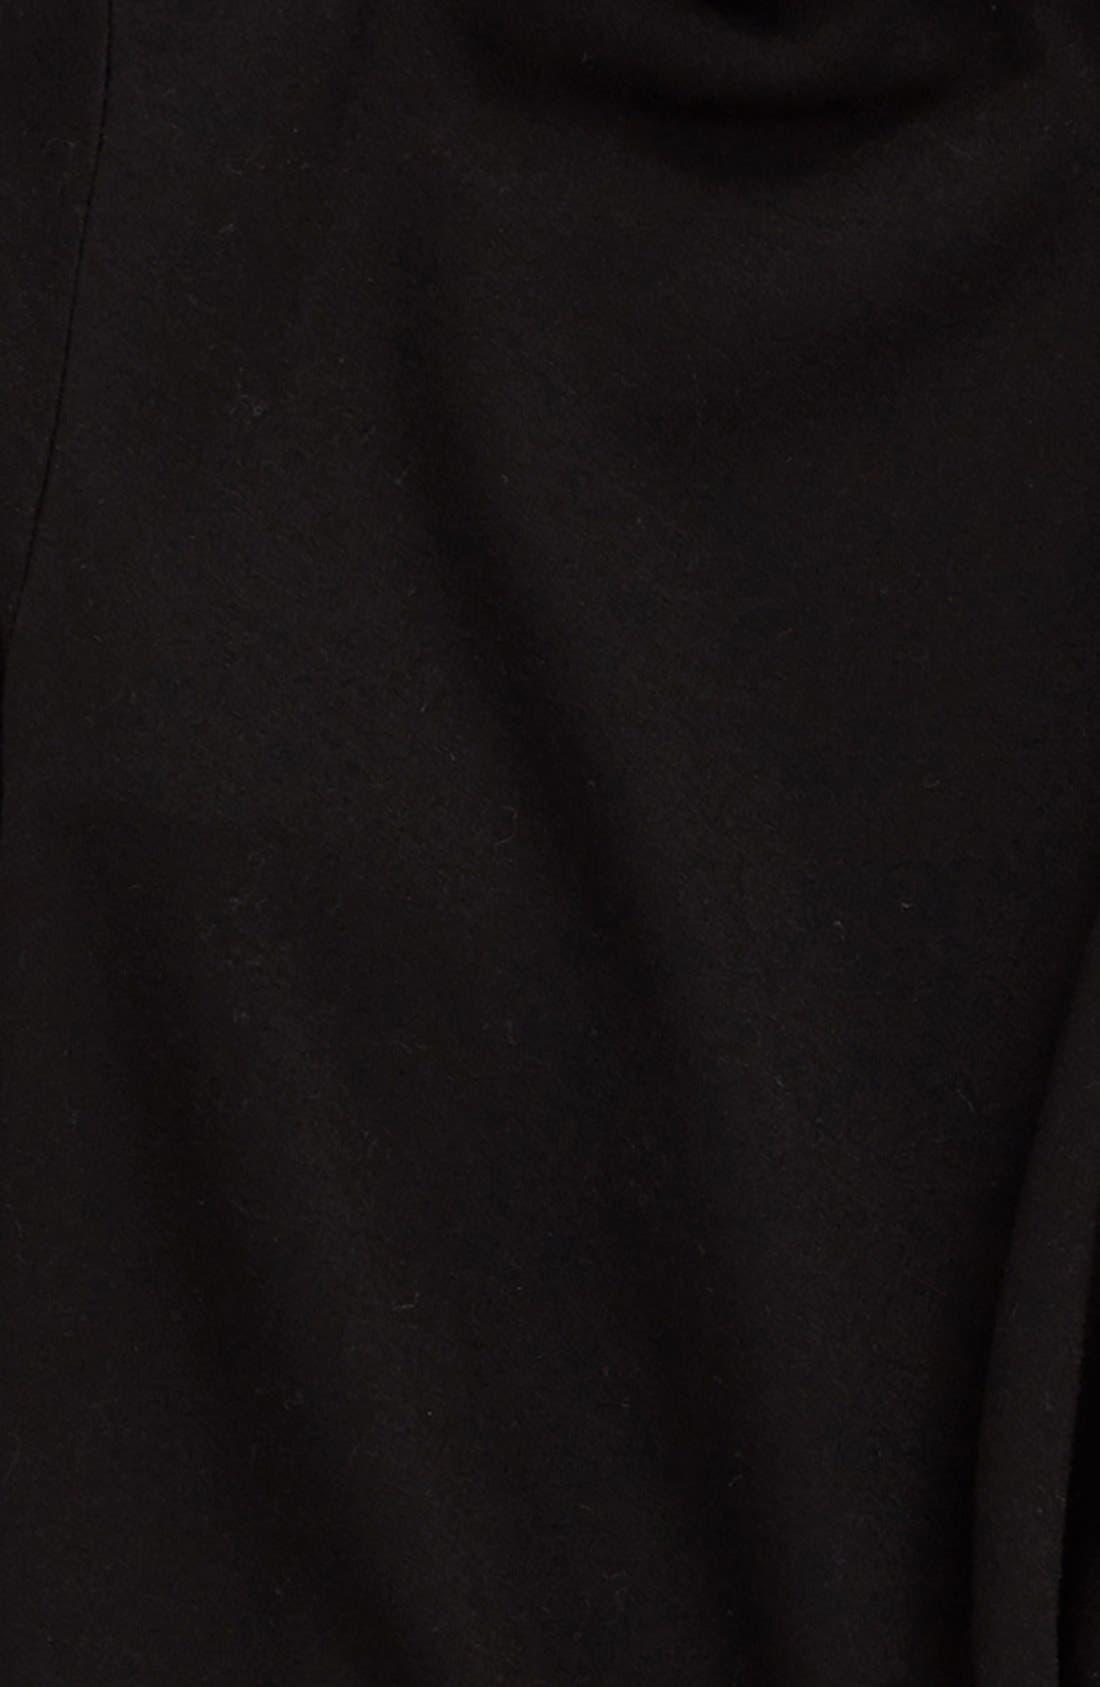 Alternate Image 3  - h.i.p. One-Button Brushed Fleece Wrap Cardigan (Big Girls)